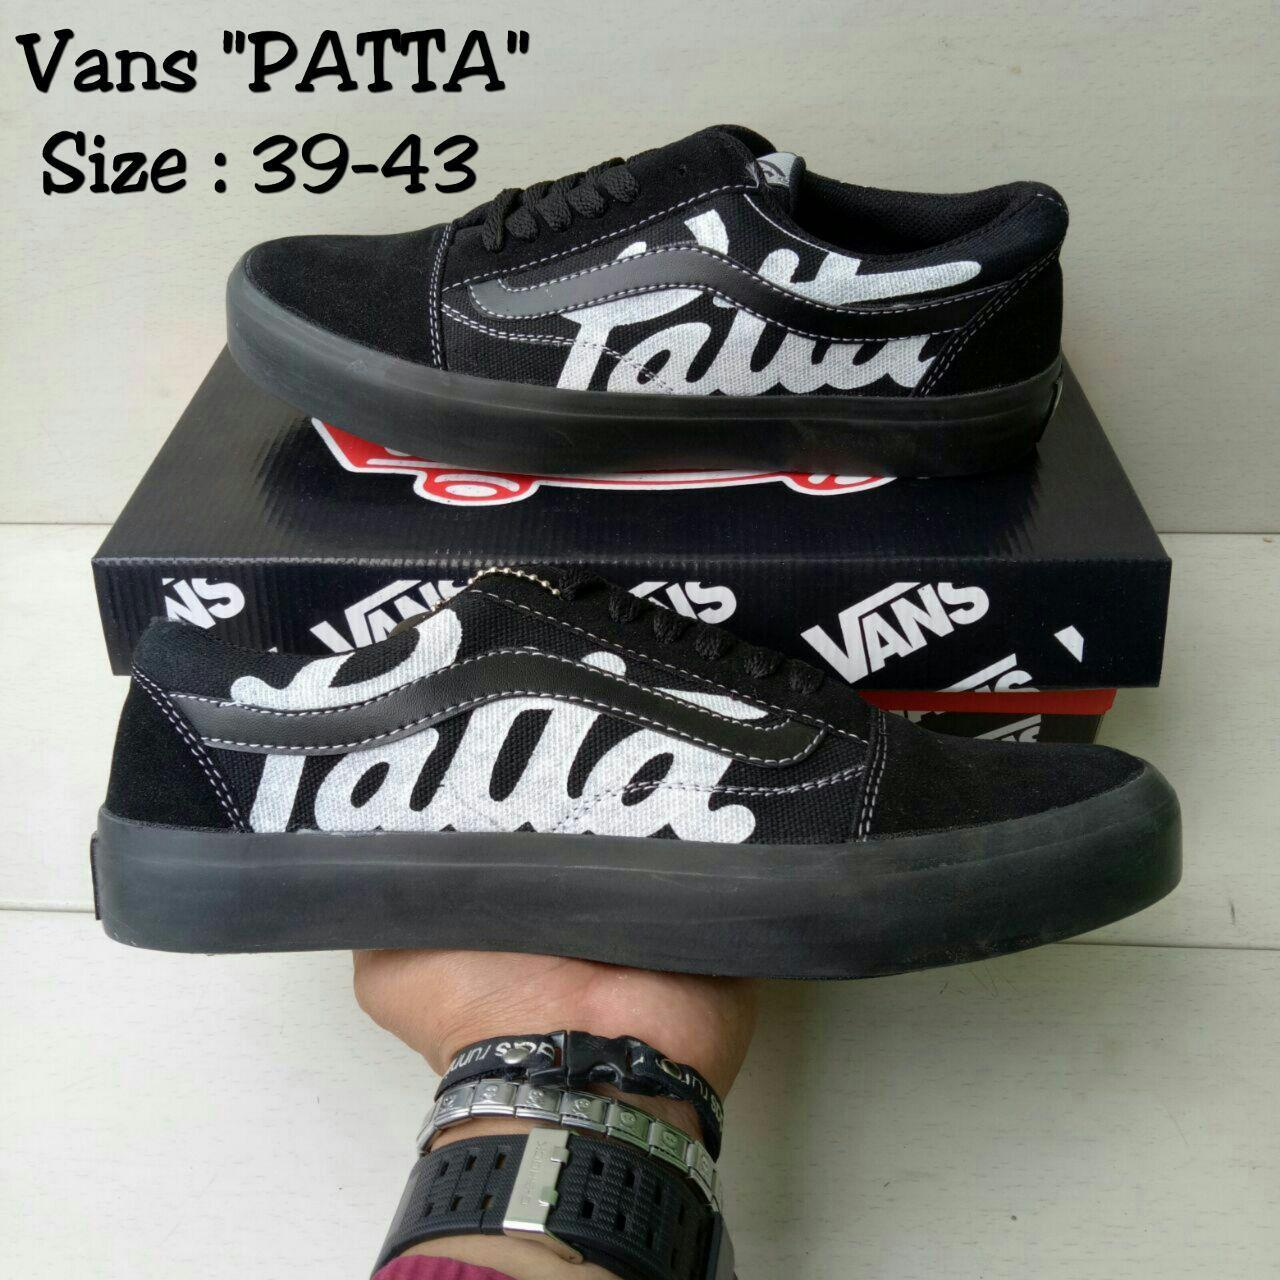 Vans Patta Black list black